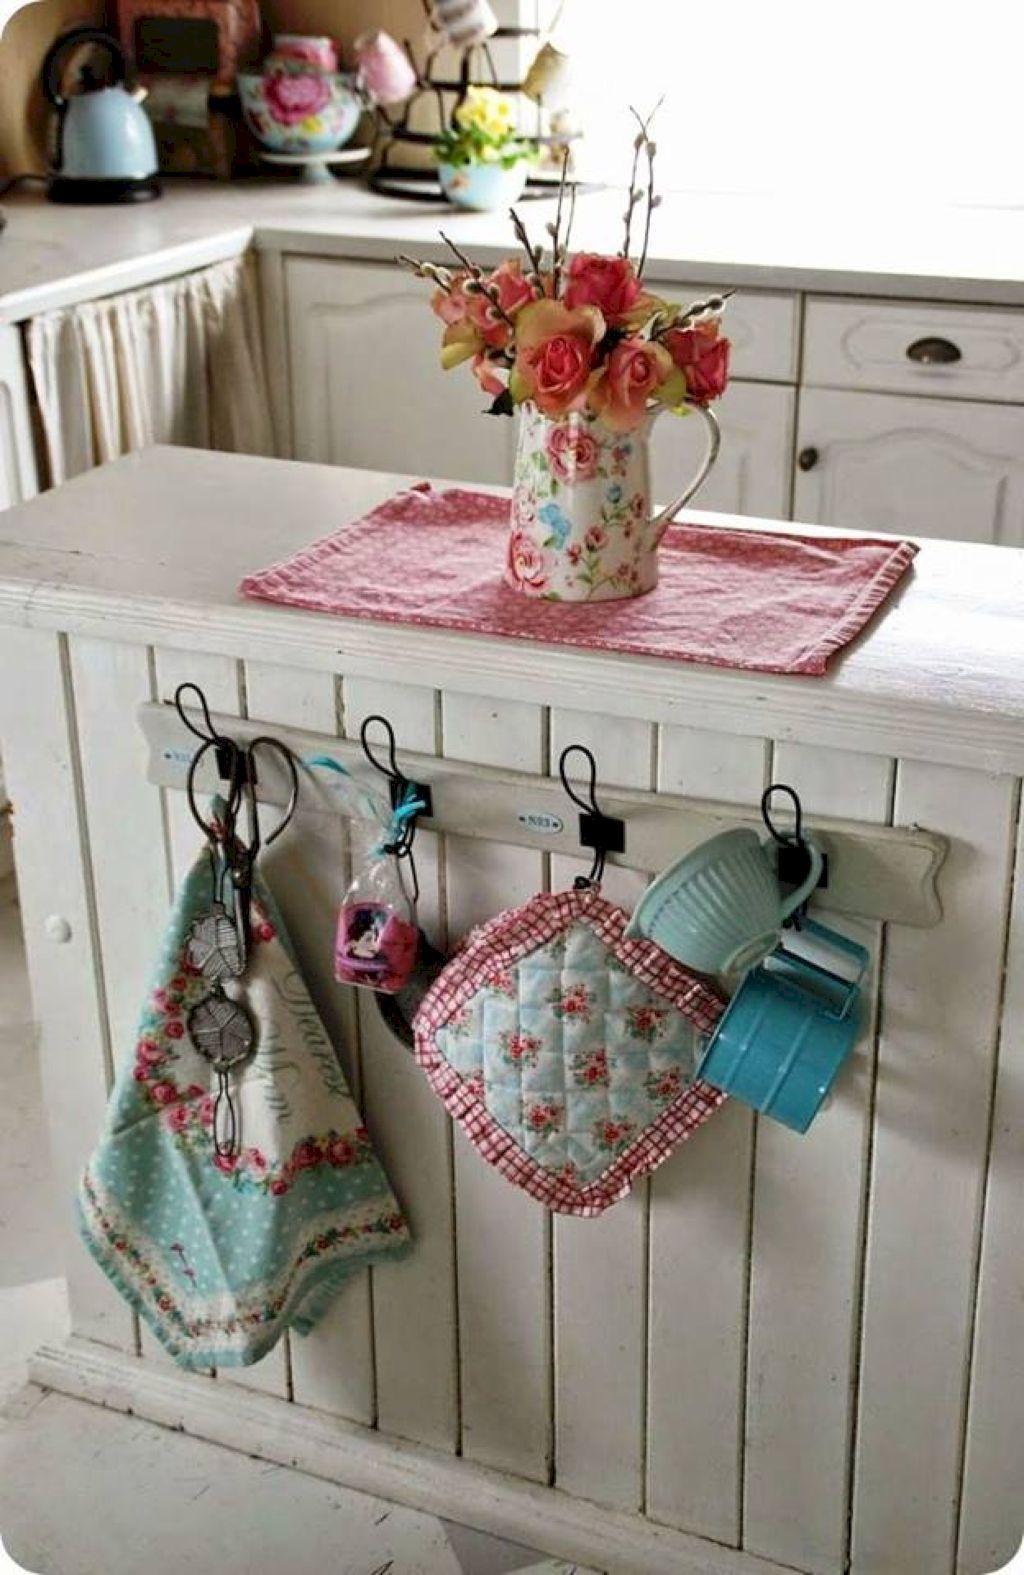 36 Smart Farmhouse Kitchen Storage Organizing Ideas | Shabby chic ...